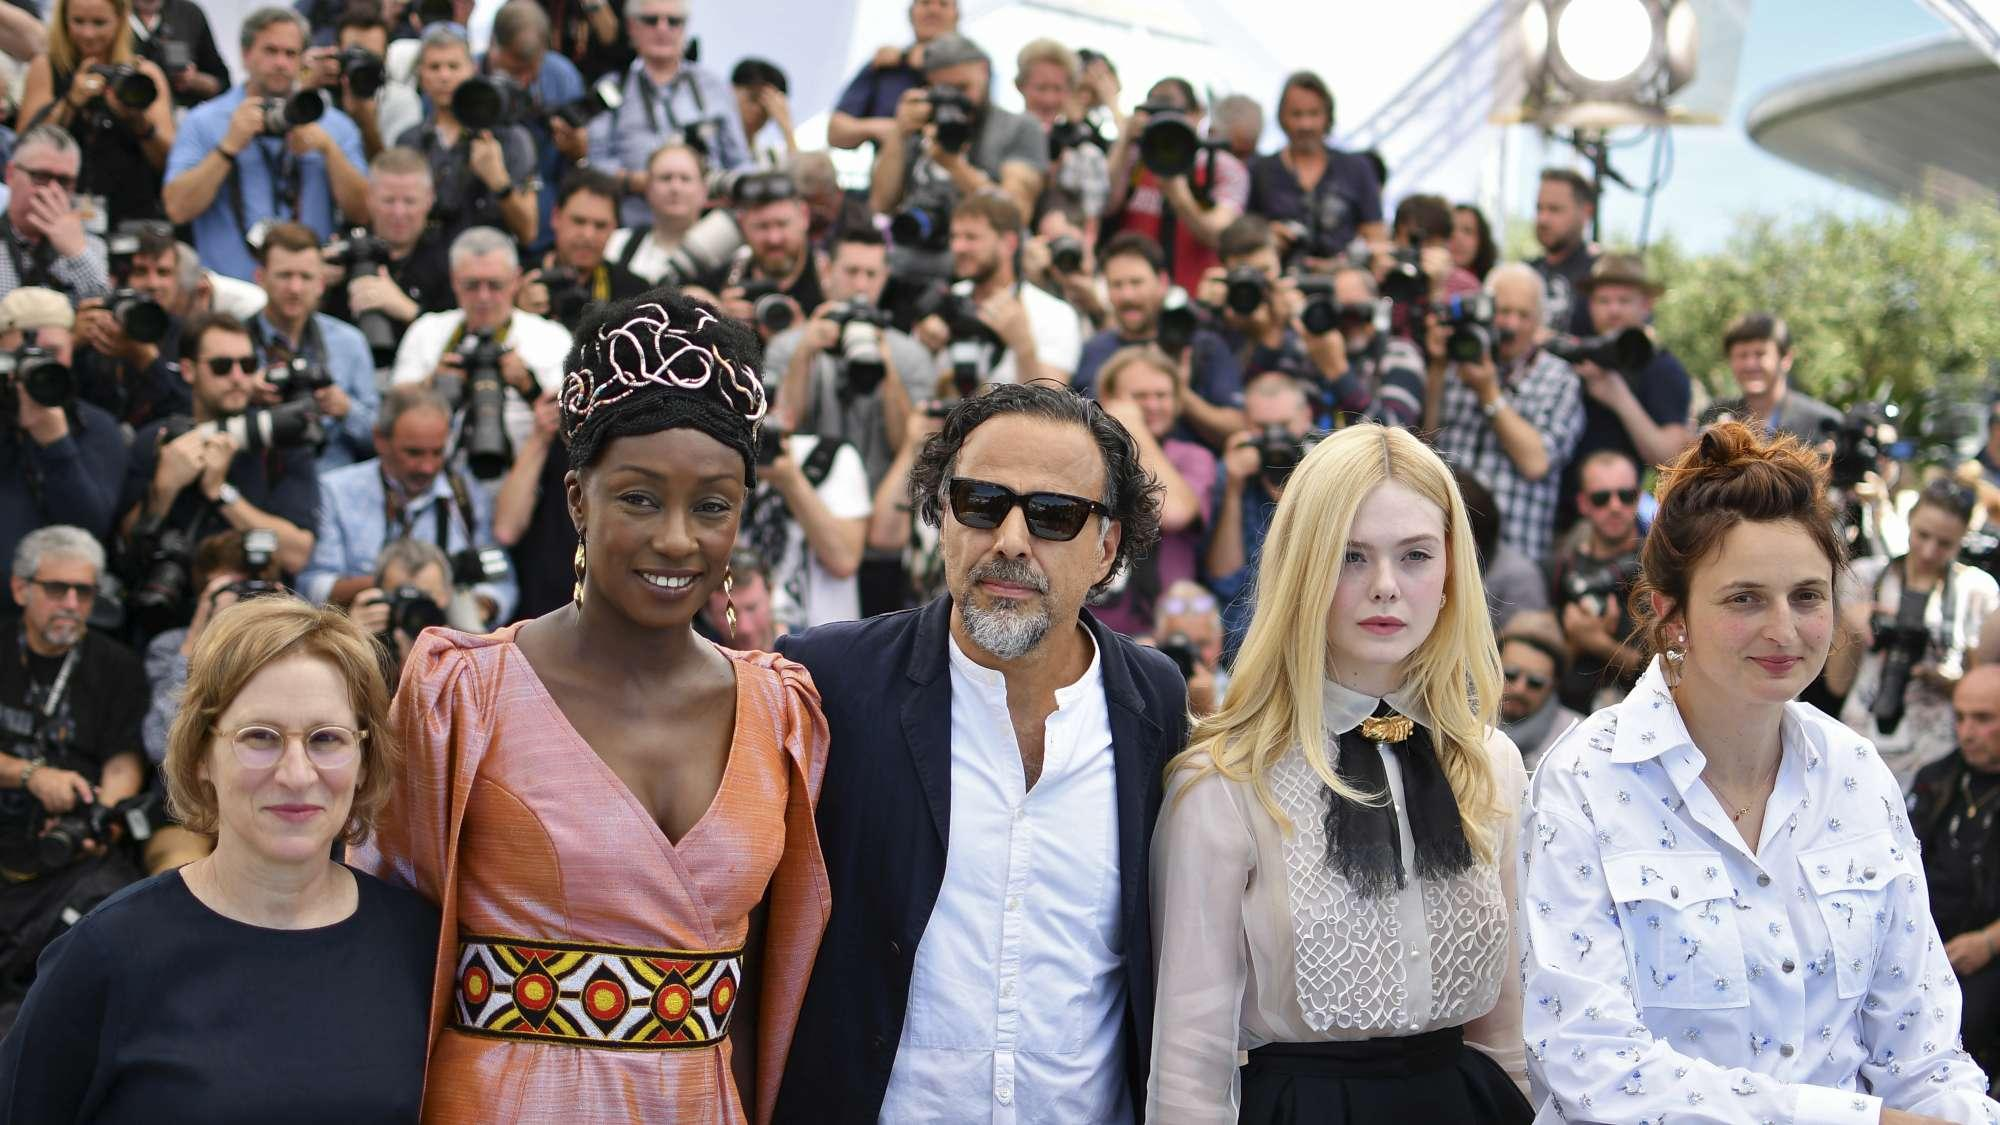 Cannes 2019, photocall della giuria presieduta da Inarritu